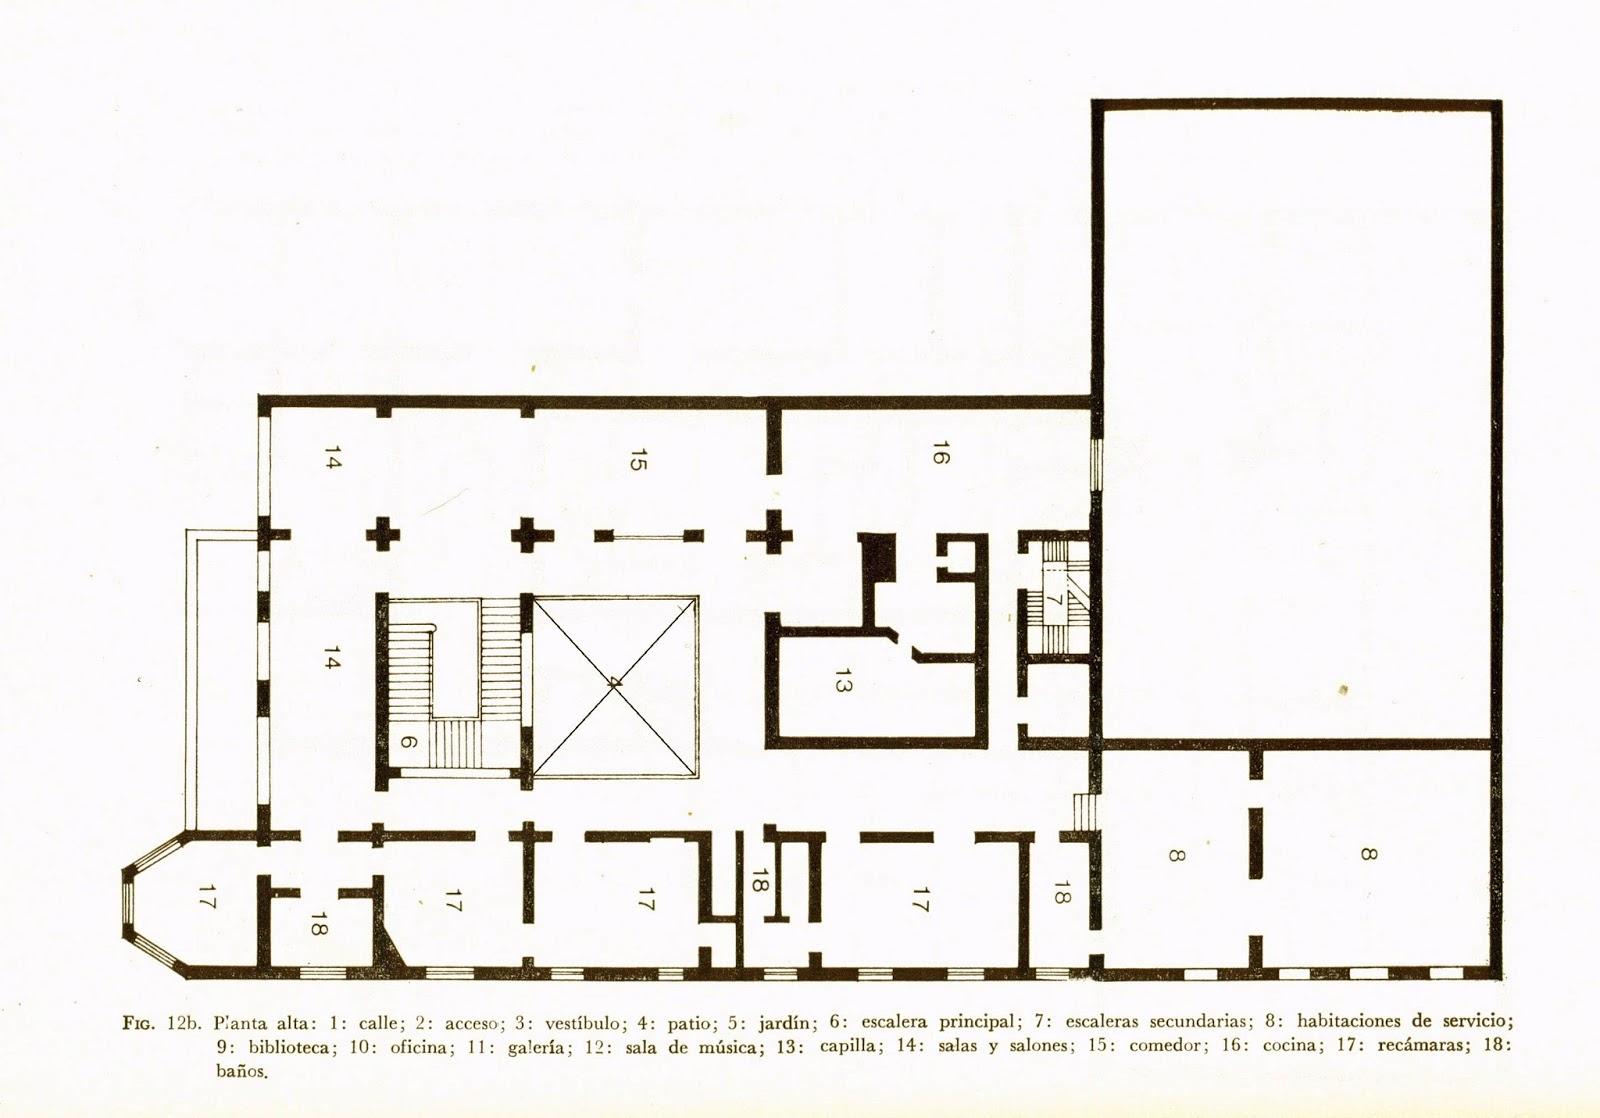 Grandes casas de m xico agosto 2015 for Planta arquitectonica biblioteca